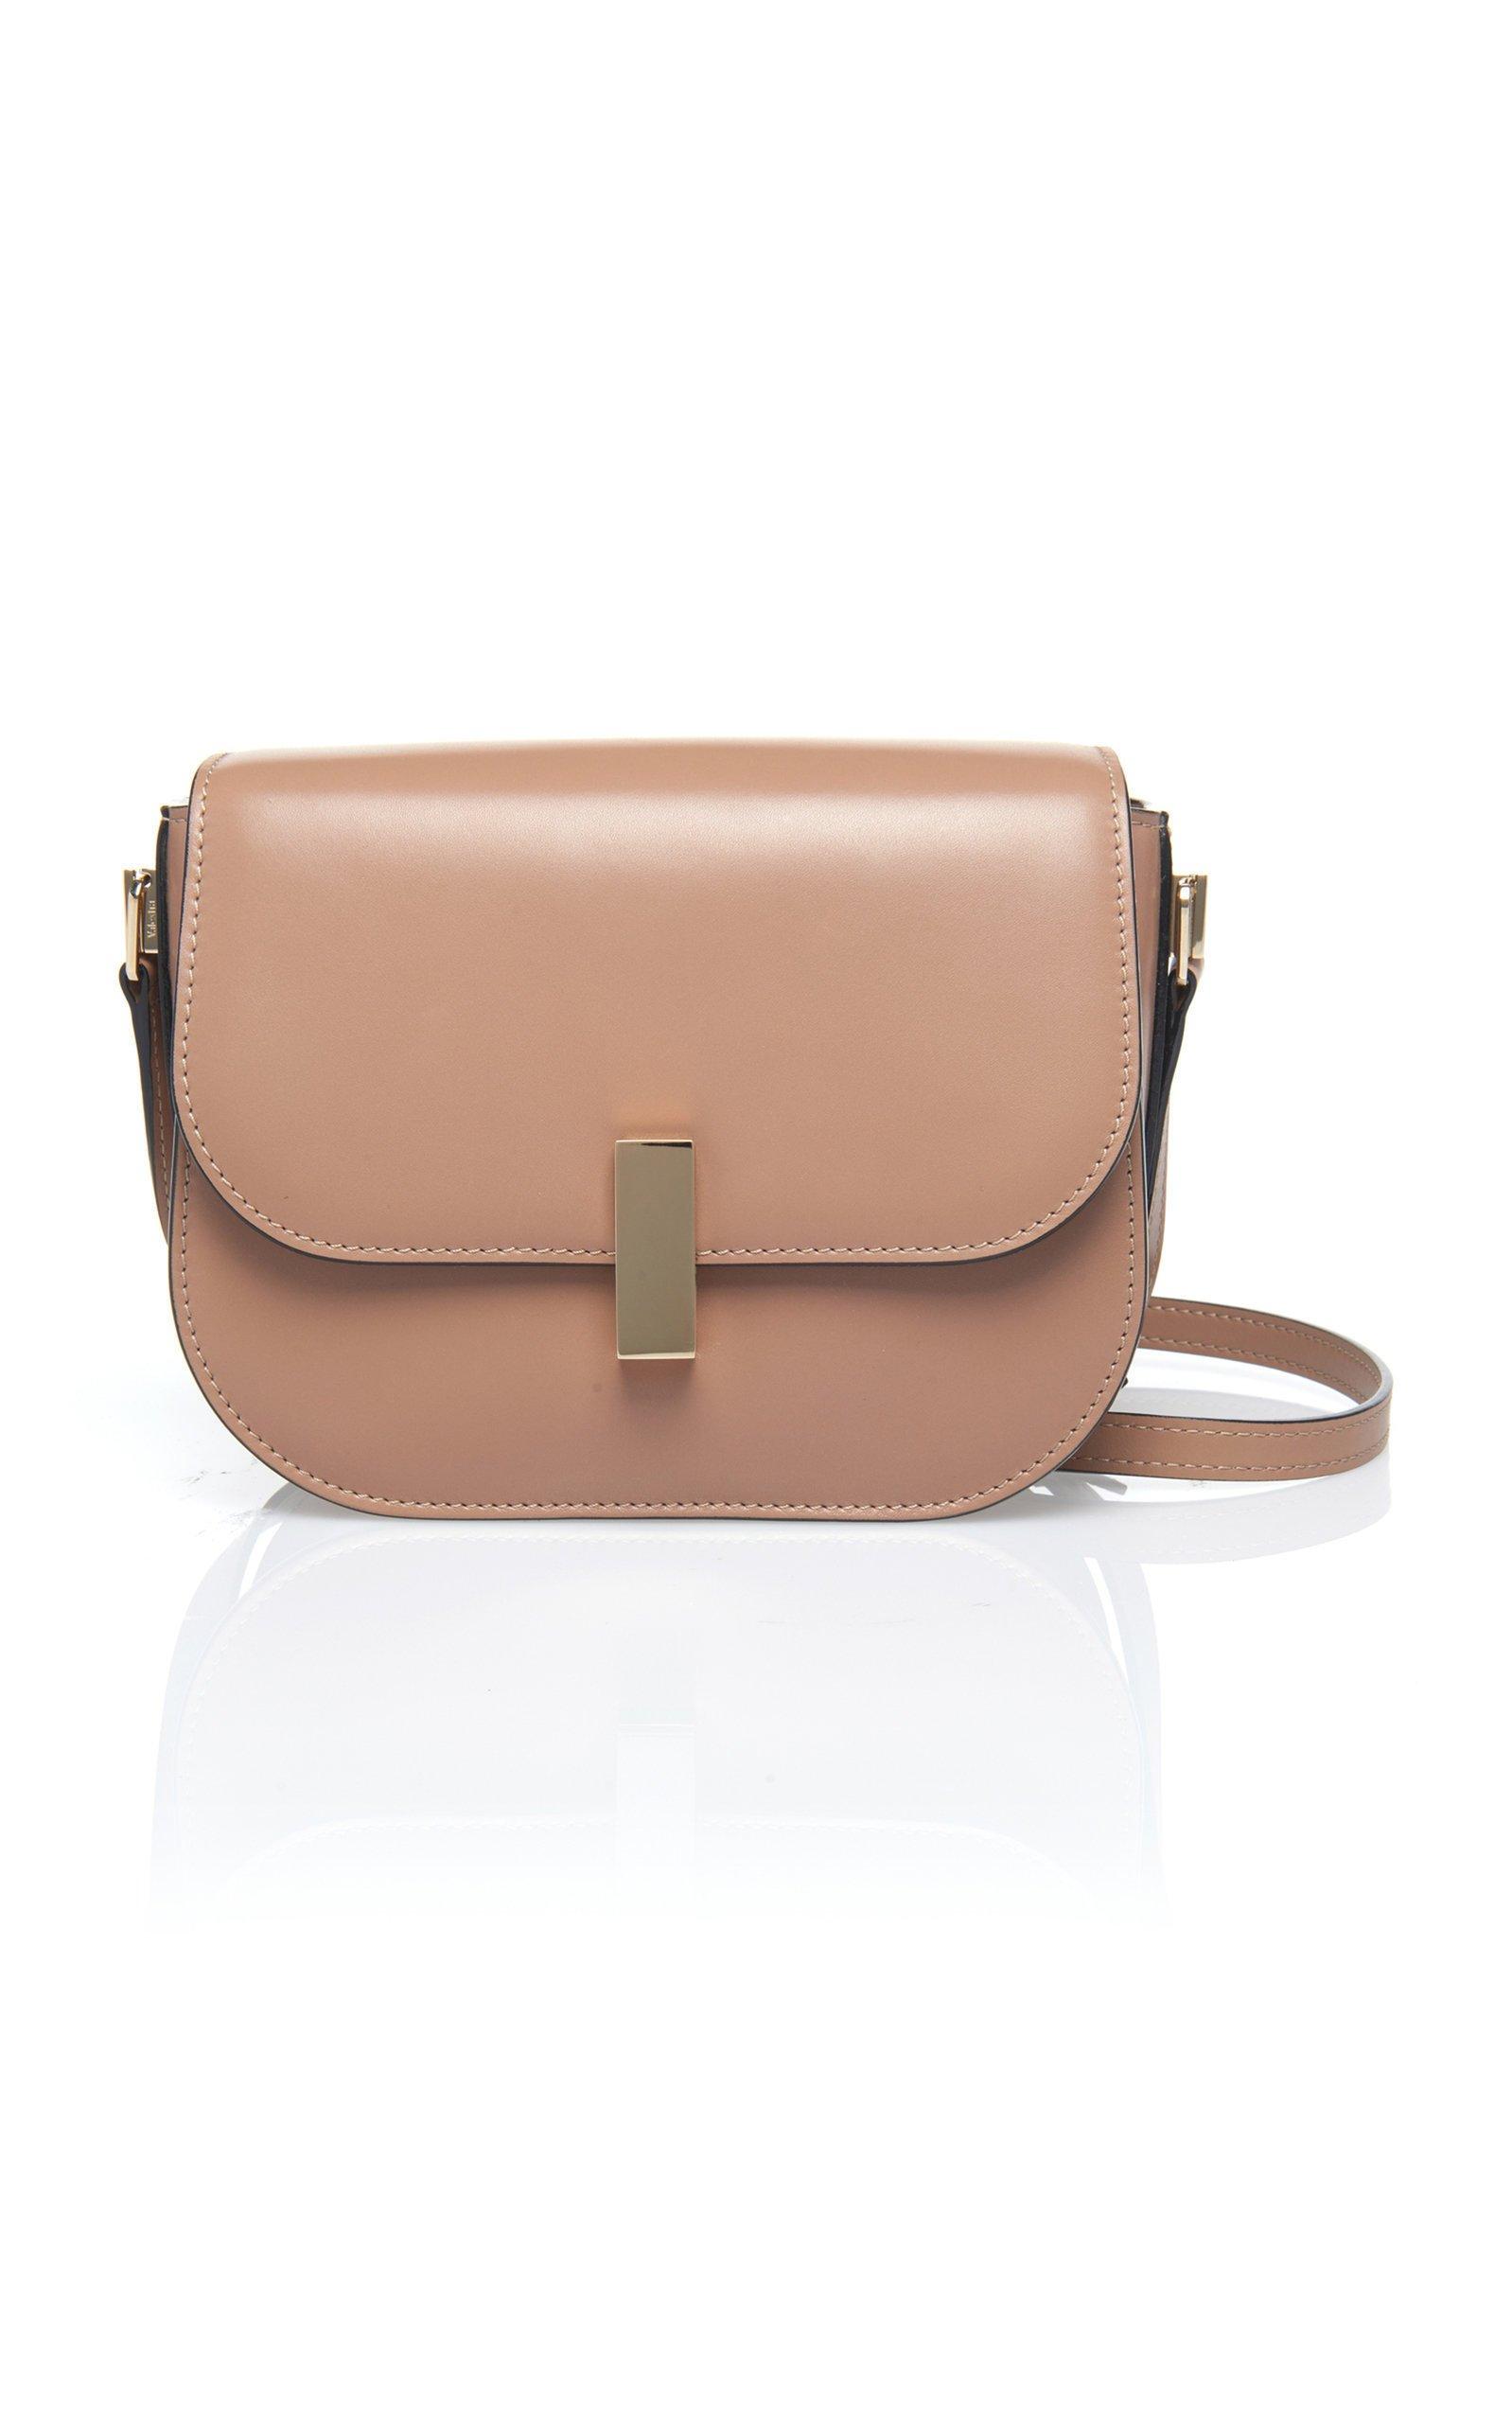 Valentino- Iside Leather Crossbody Bag